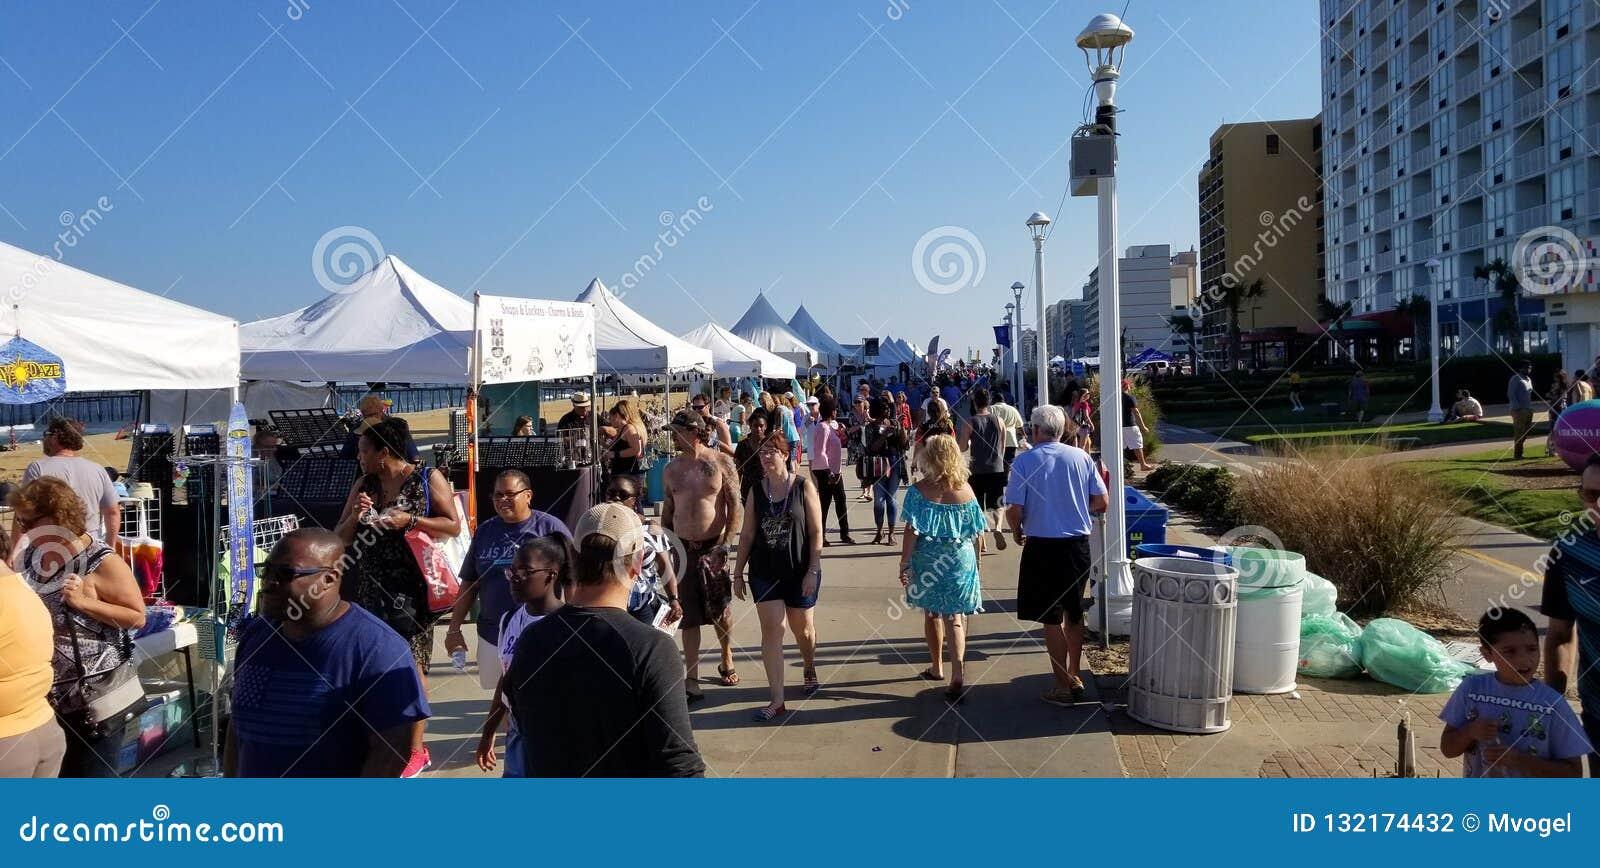 Virginia Beach Boardwalk Festival